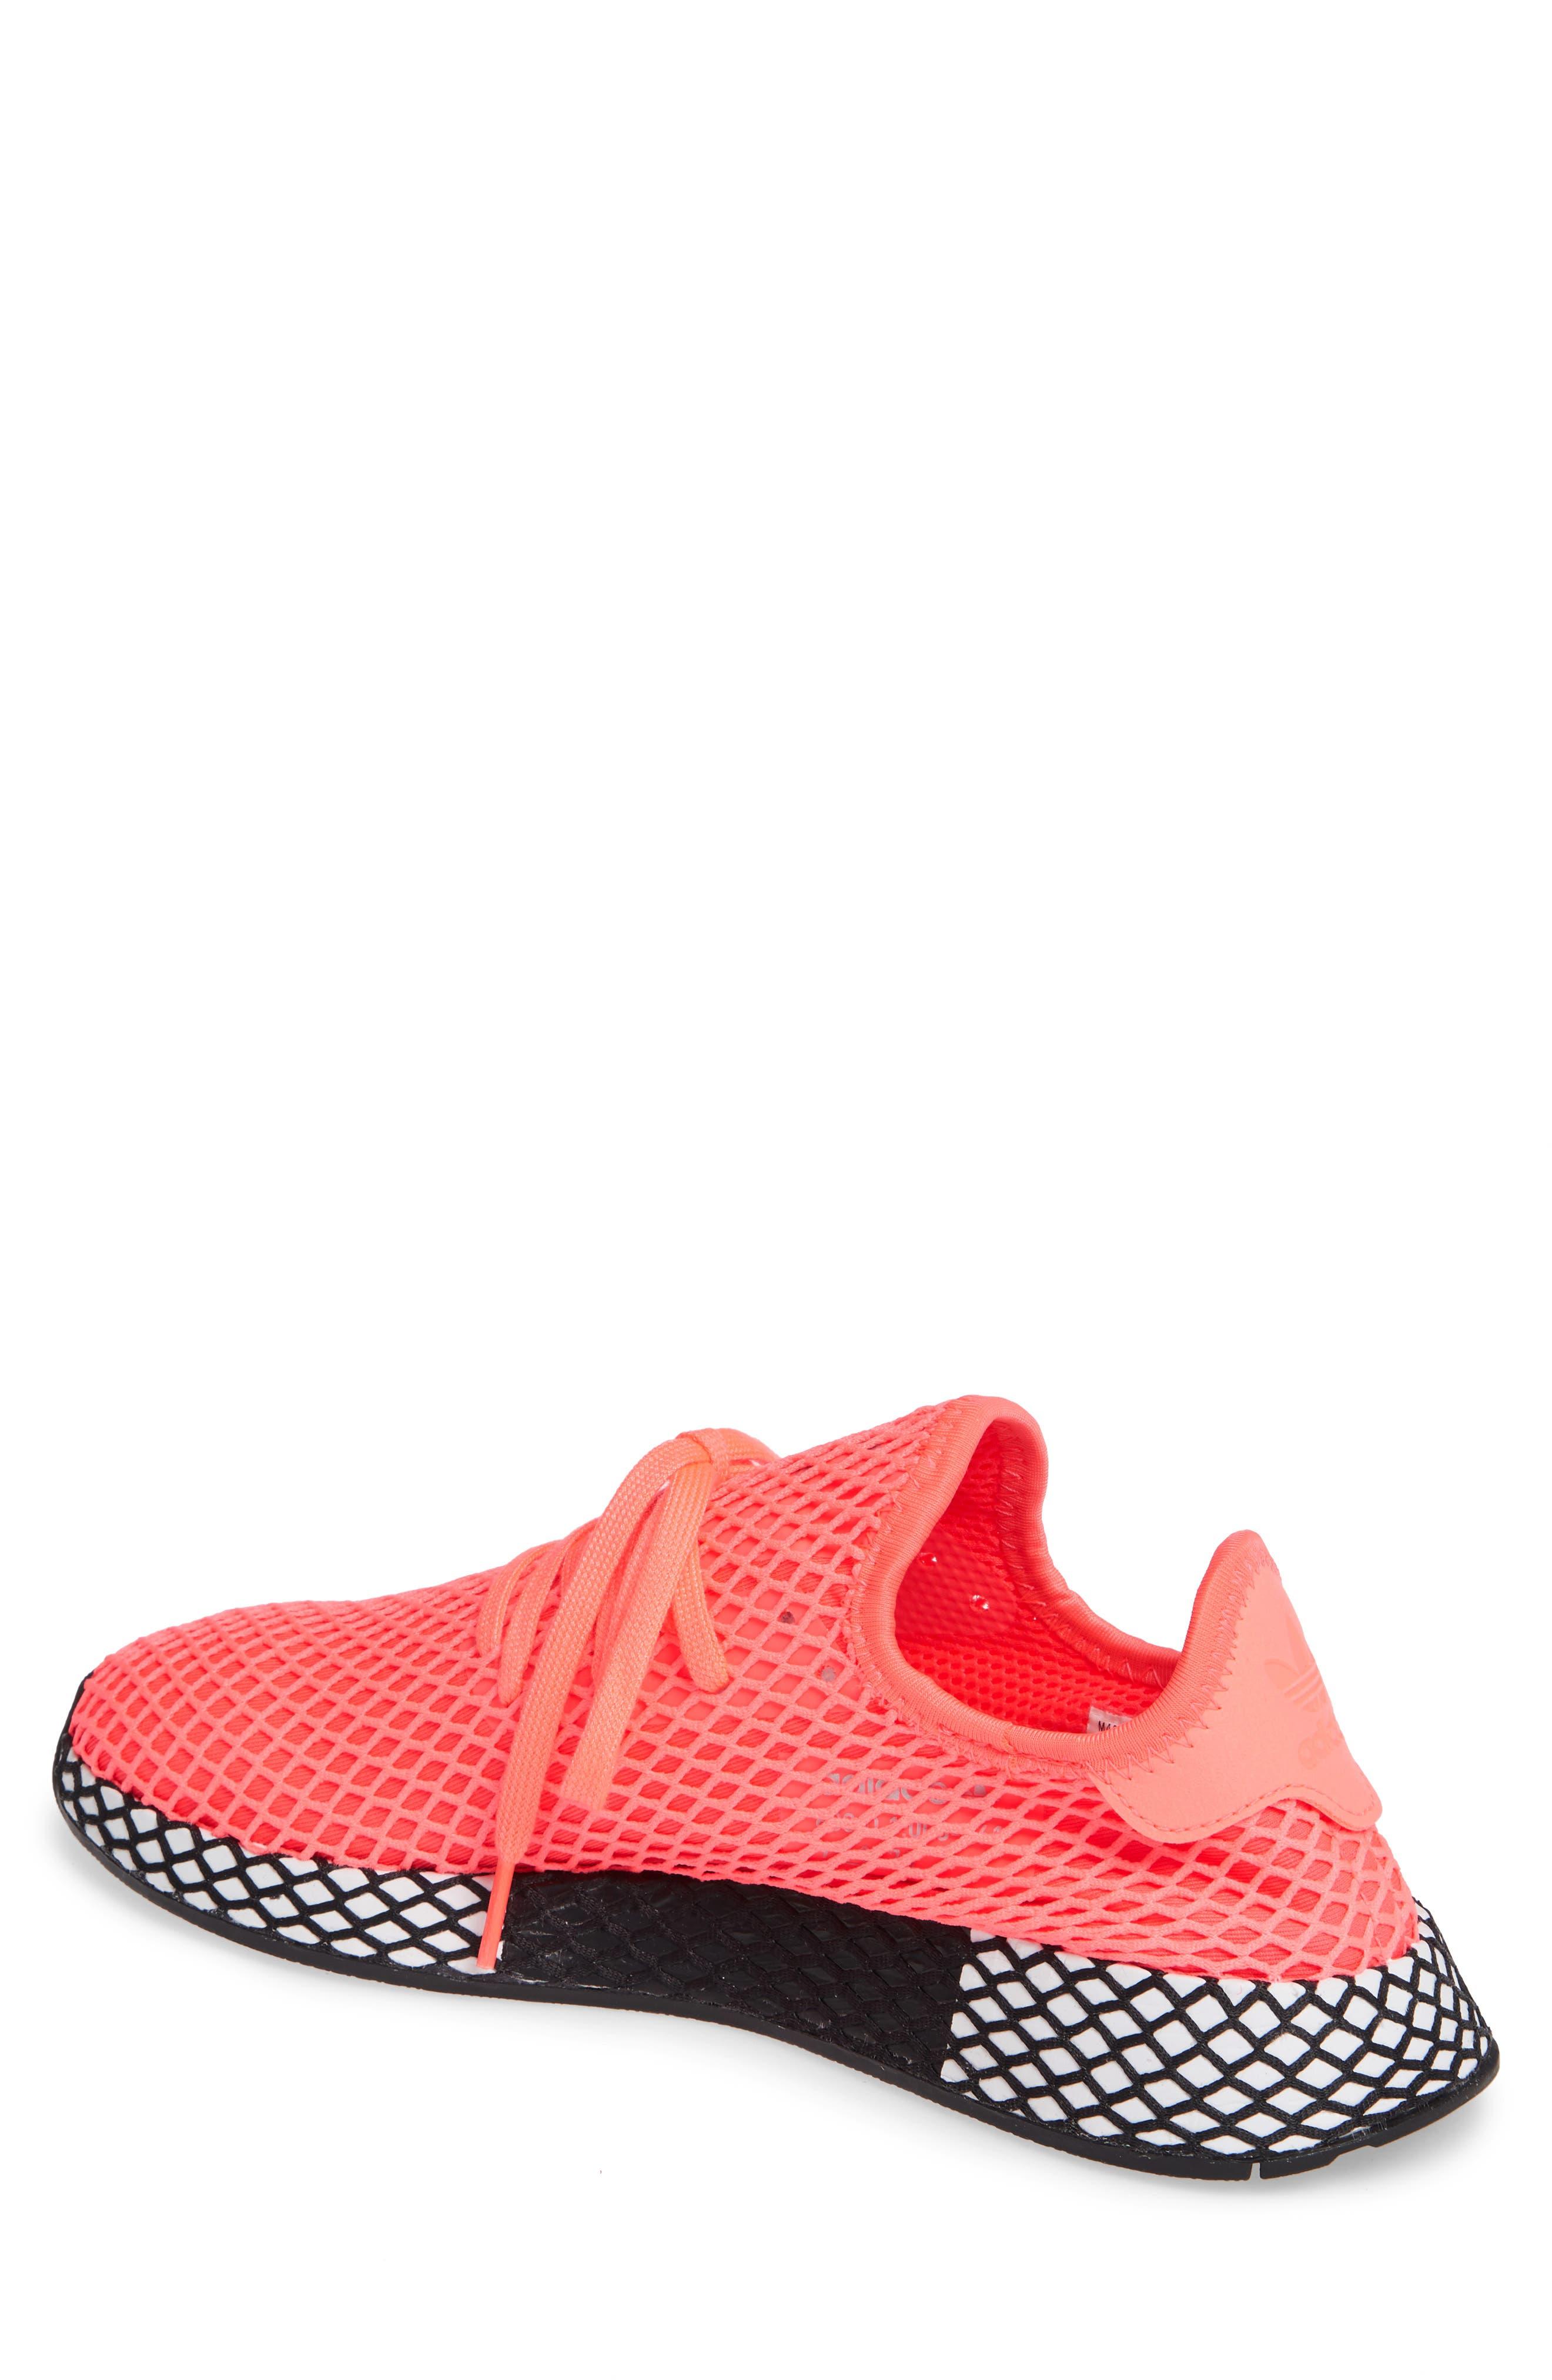 Deerupt Runner Sneaker,                             Alternate thumbnail 15, color,